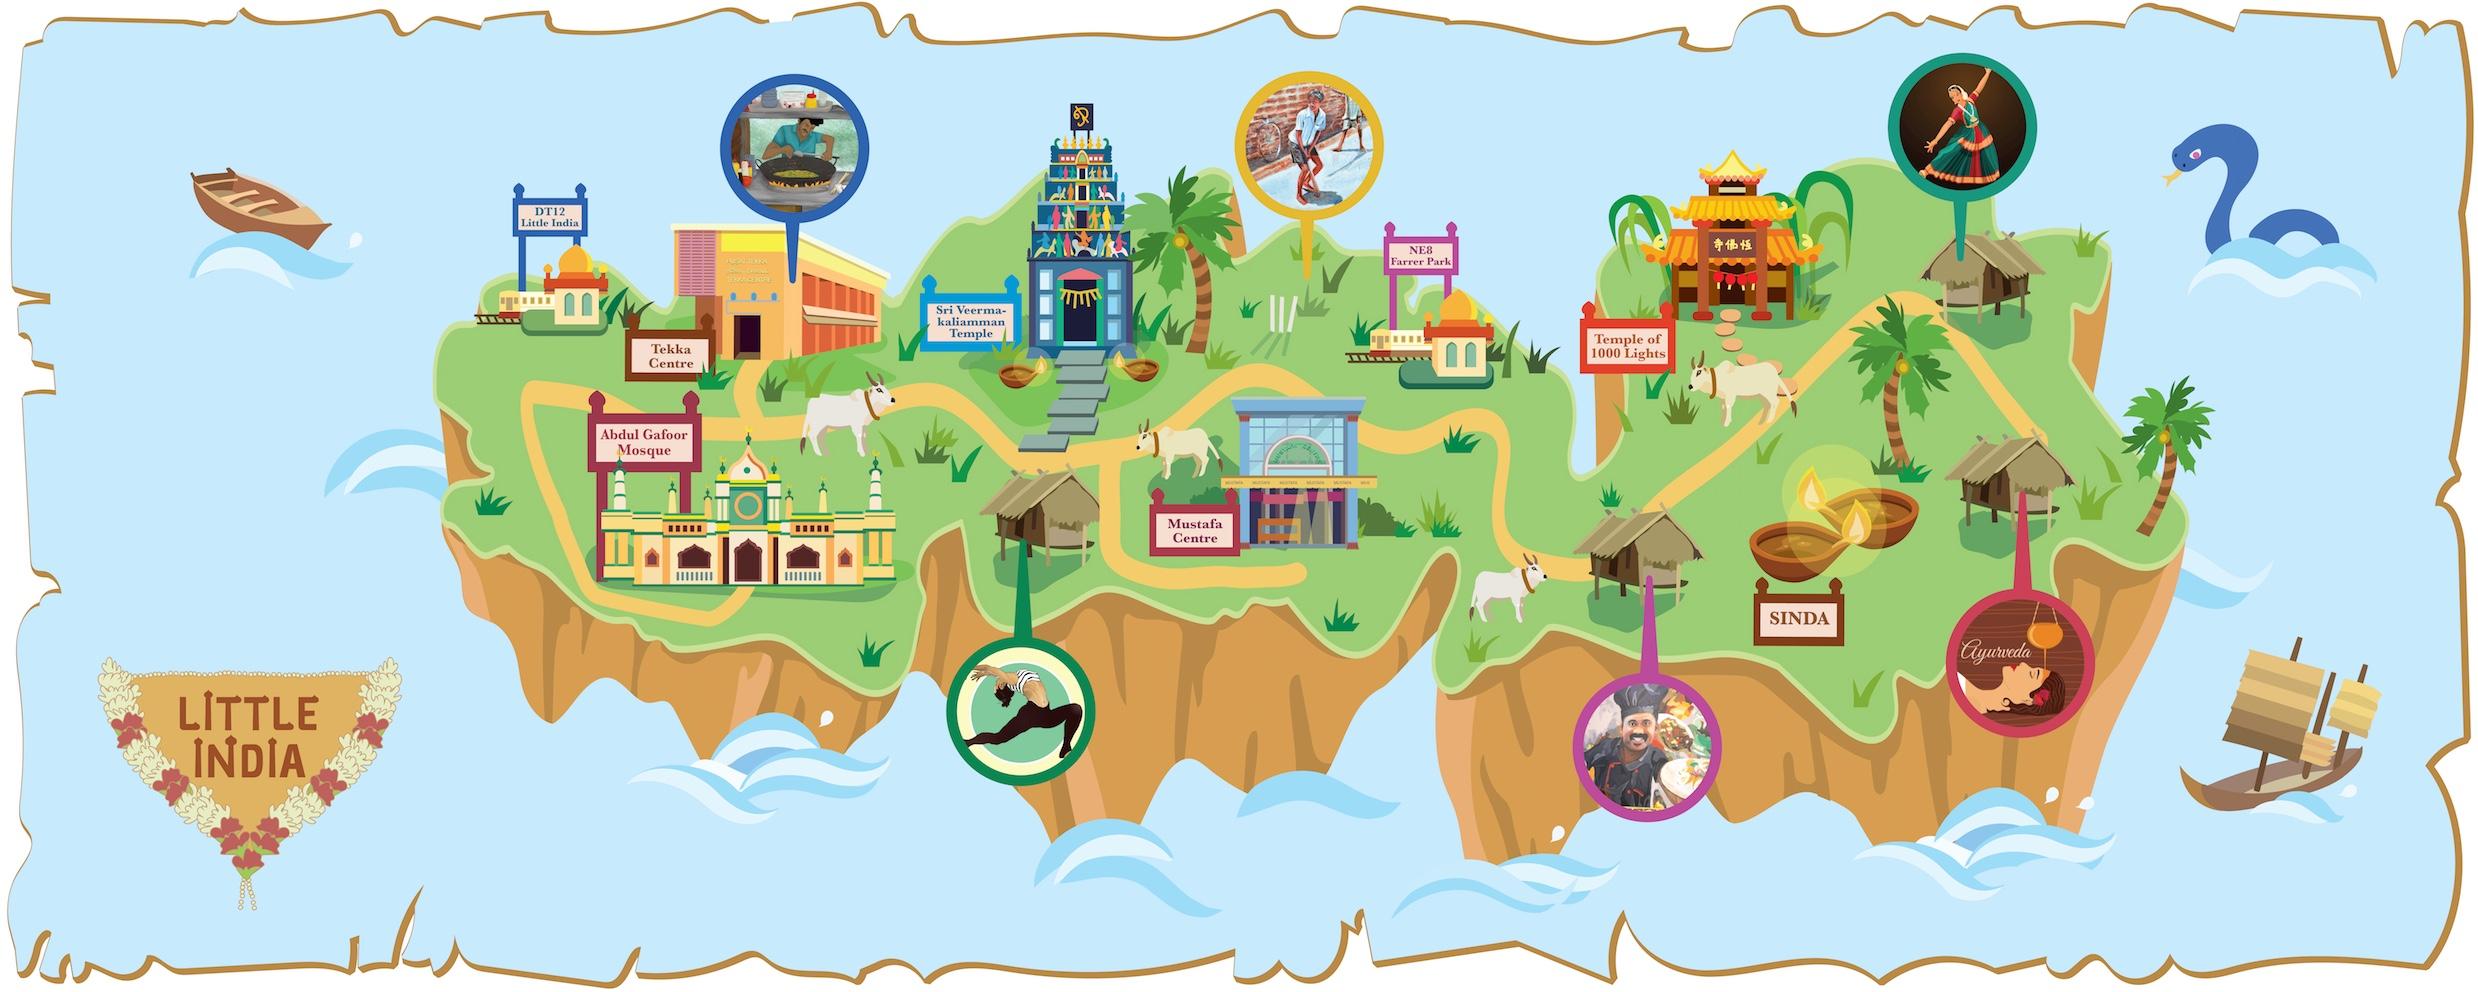 little india island website.jpeg